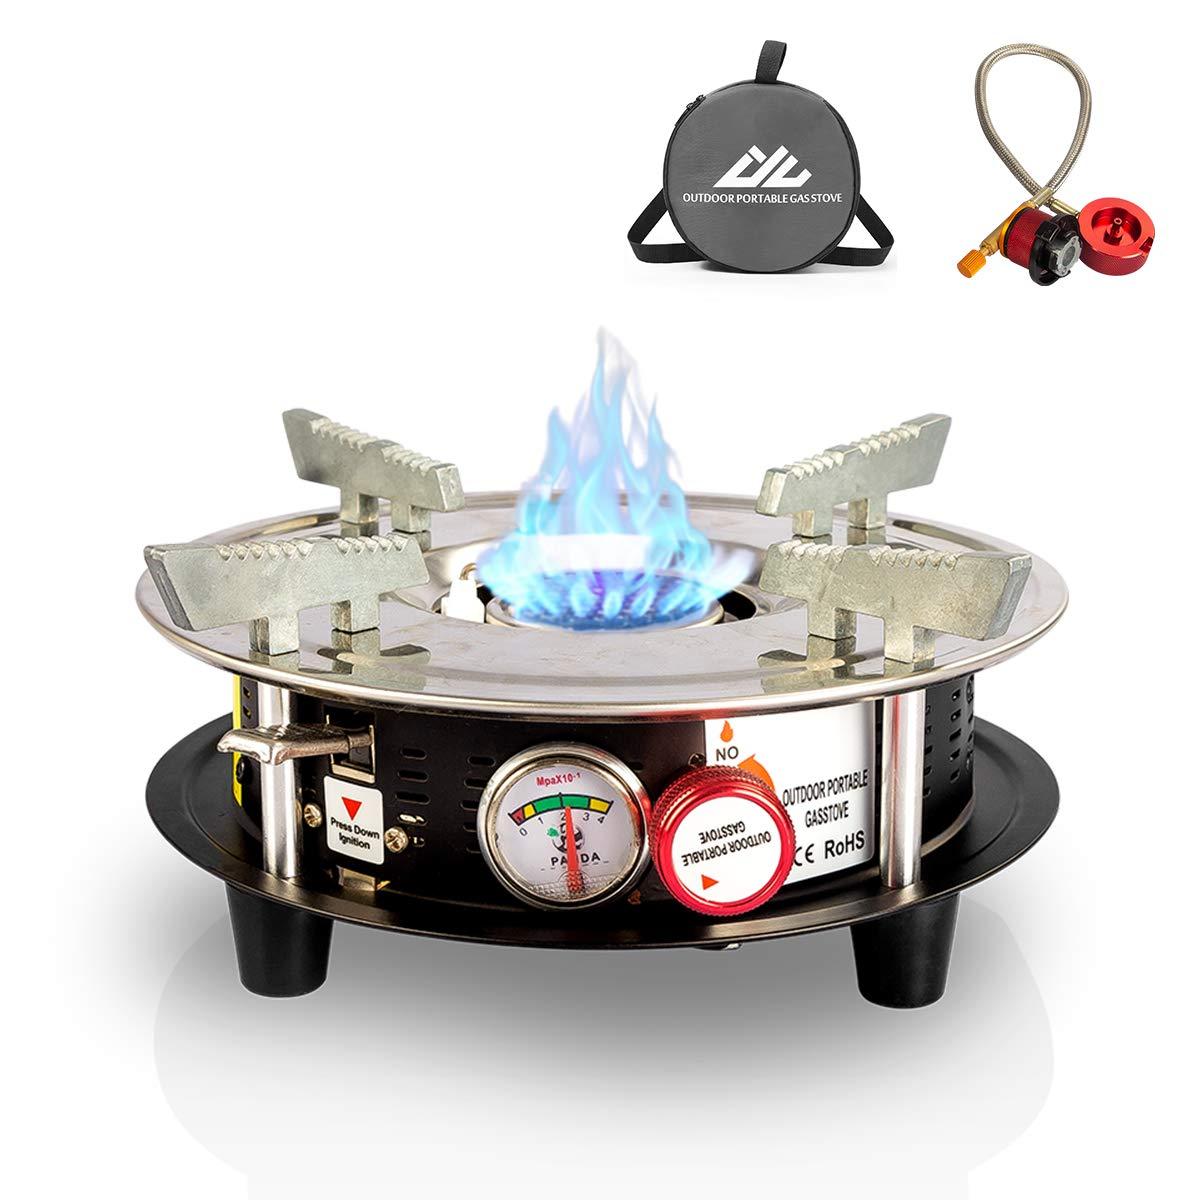 Drhob Portable Cooking Gas Stove Burner 10,000 BTU Dual Fuel Propane Butane Patio Backpacking Stove Propane Regulator hose & Storage Bag Outdoor, Hiking,Camping,Home Brewing Equipment